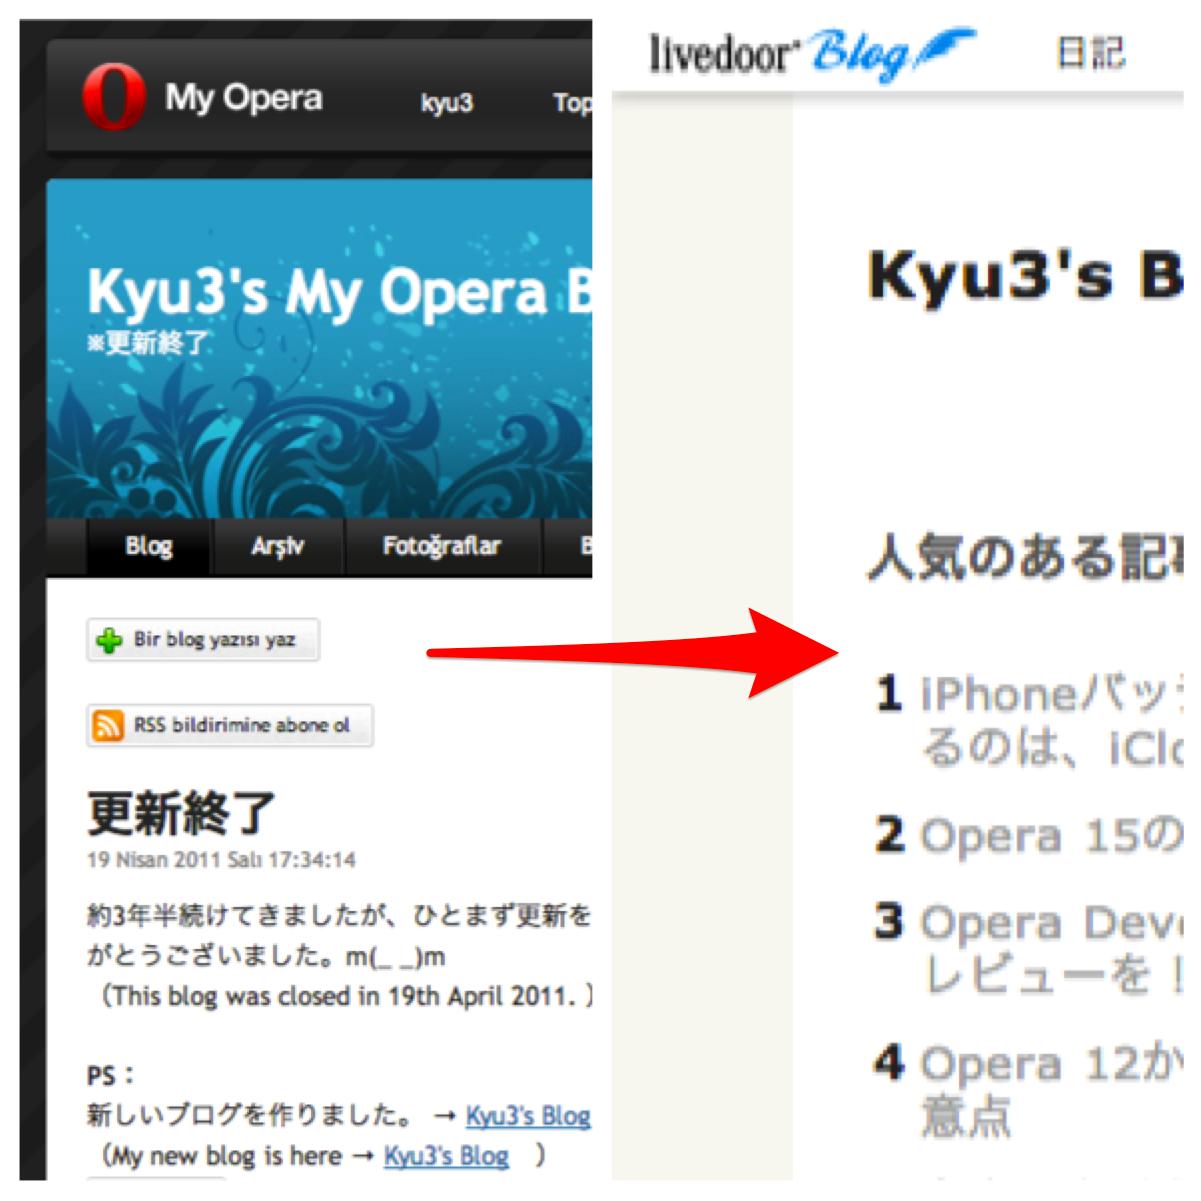 「My Opera」のブログ記事を「ライブドアブログ」(このブログ)に移行!